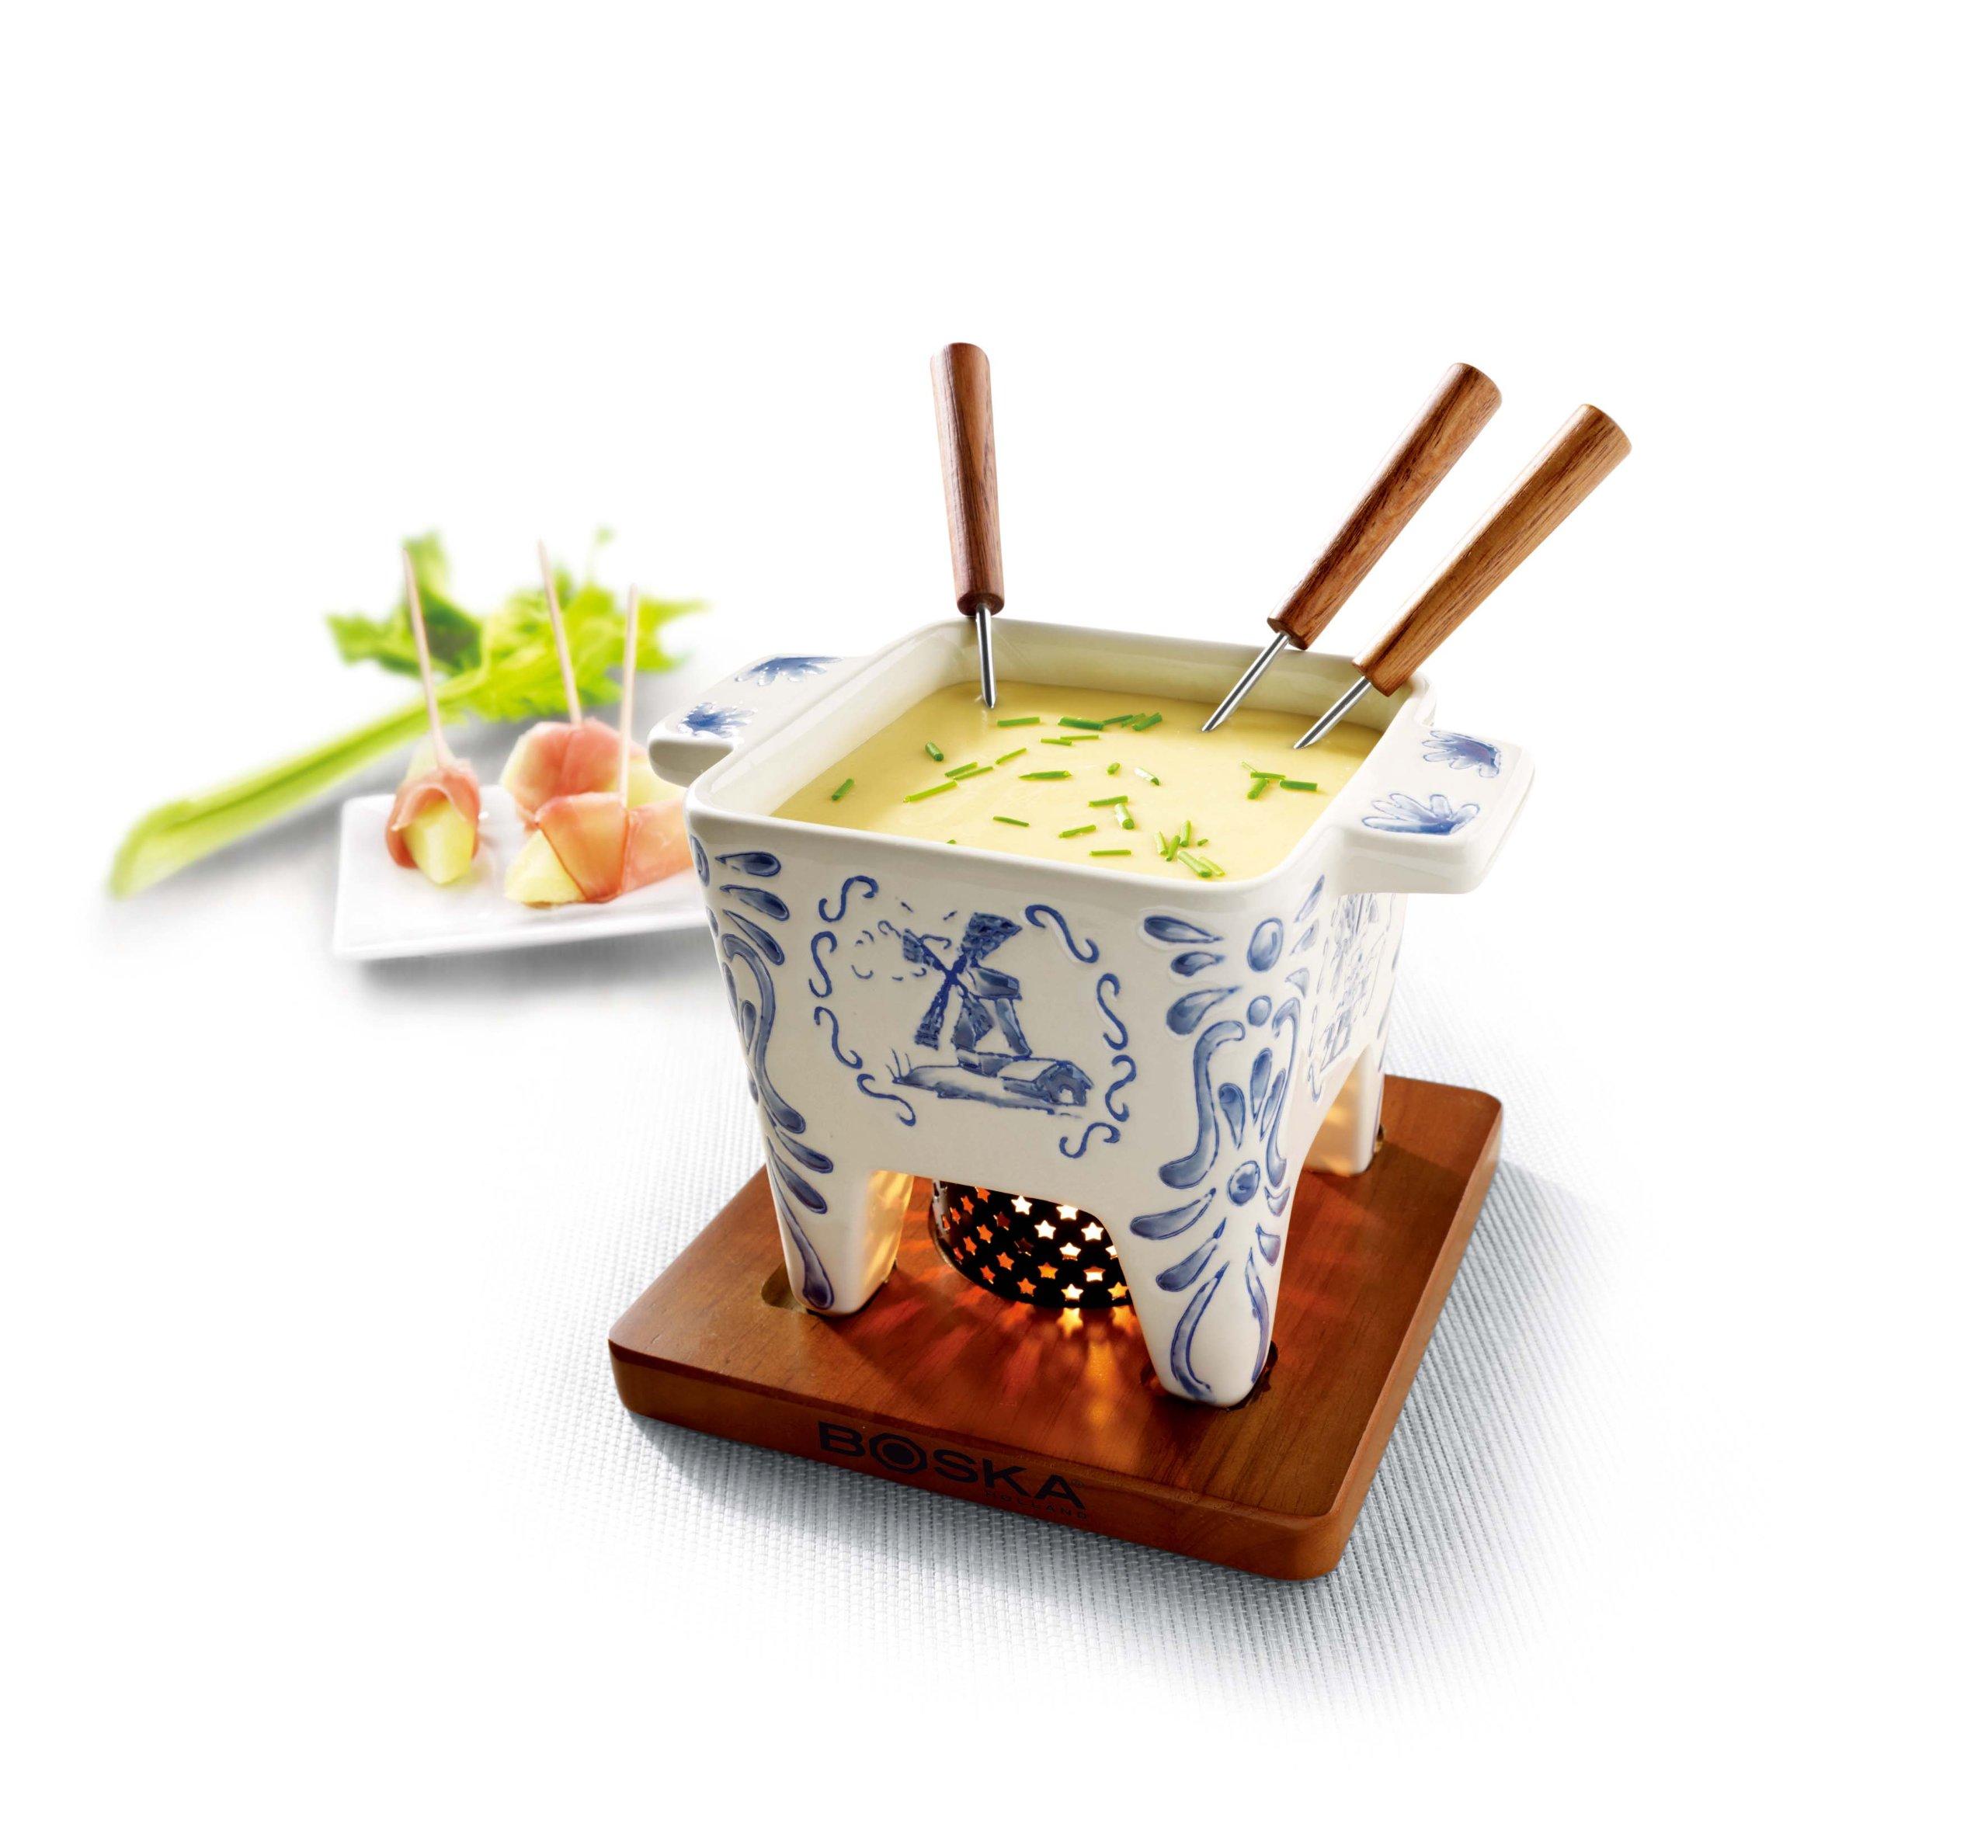 Boska Holland 853538 Boska Cheese Delft Blue Fondue Pot, 400 ml, White